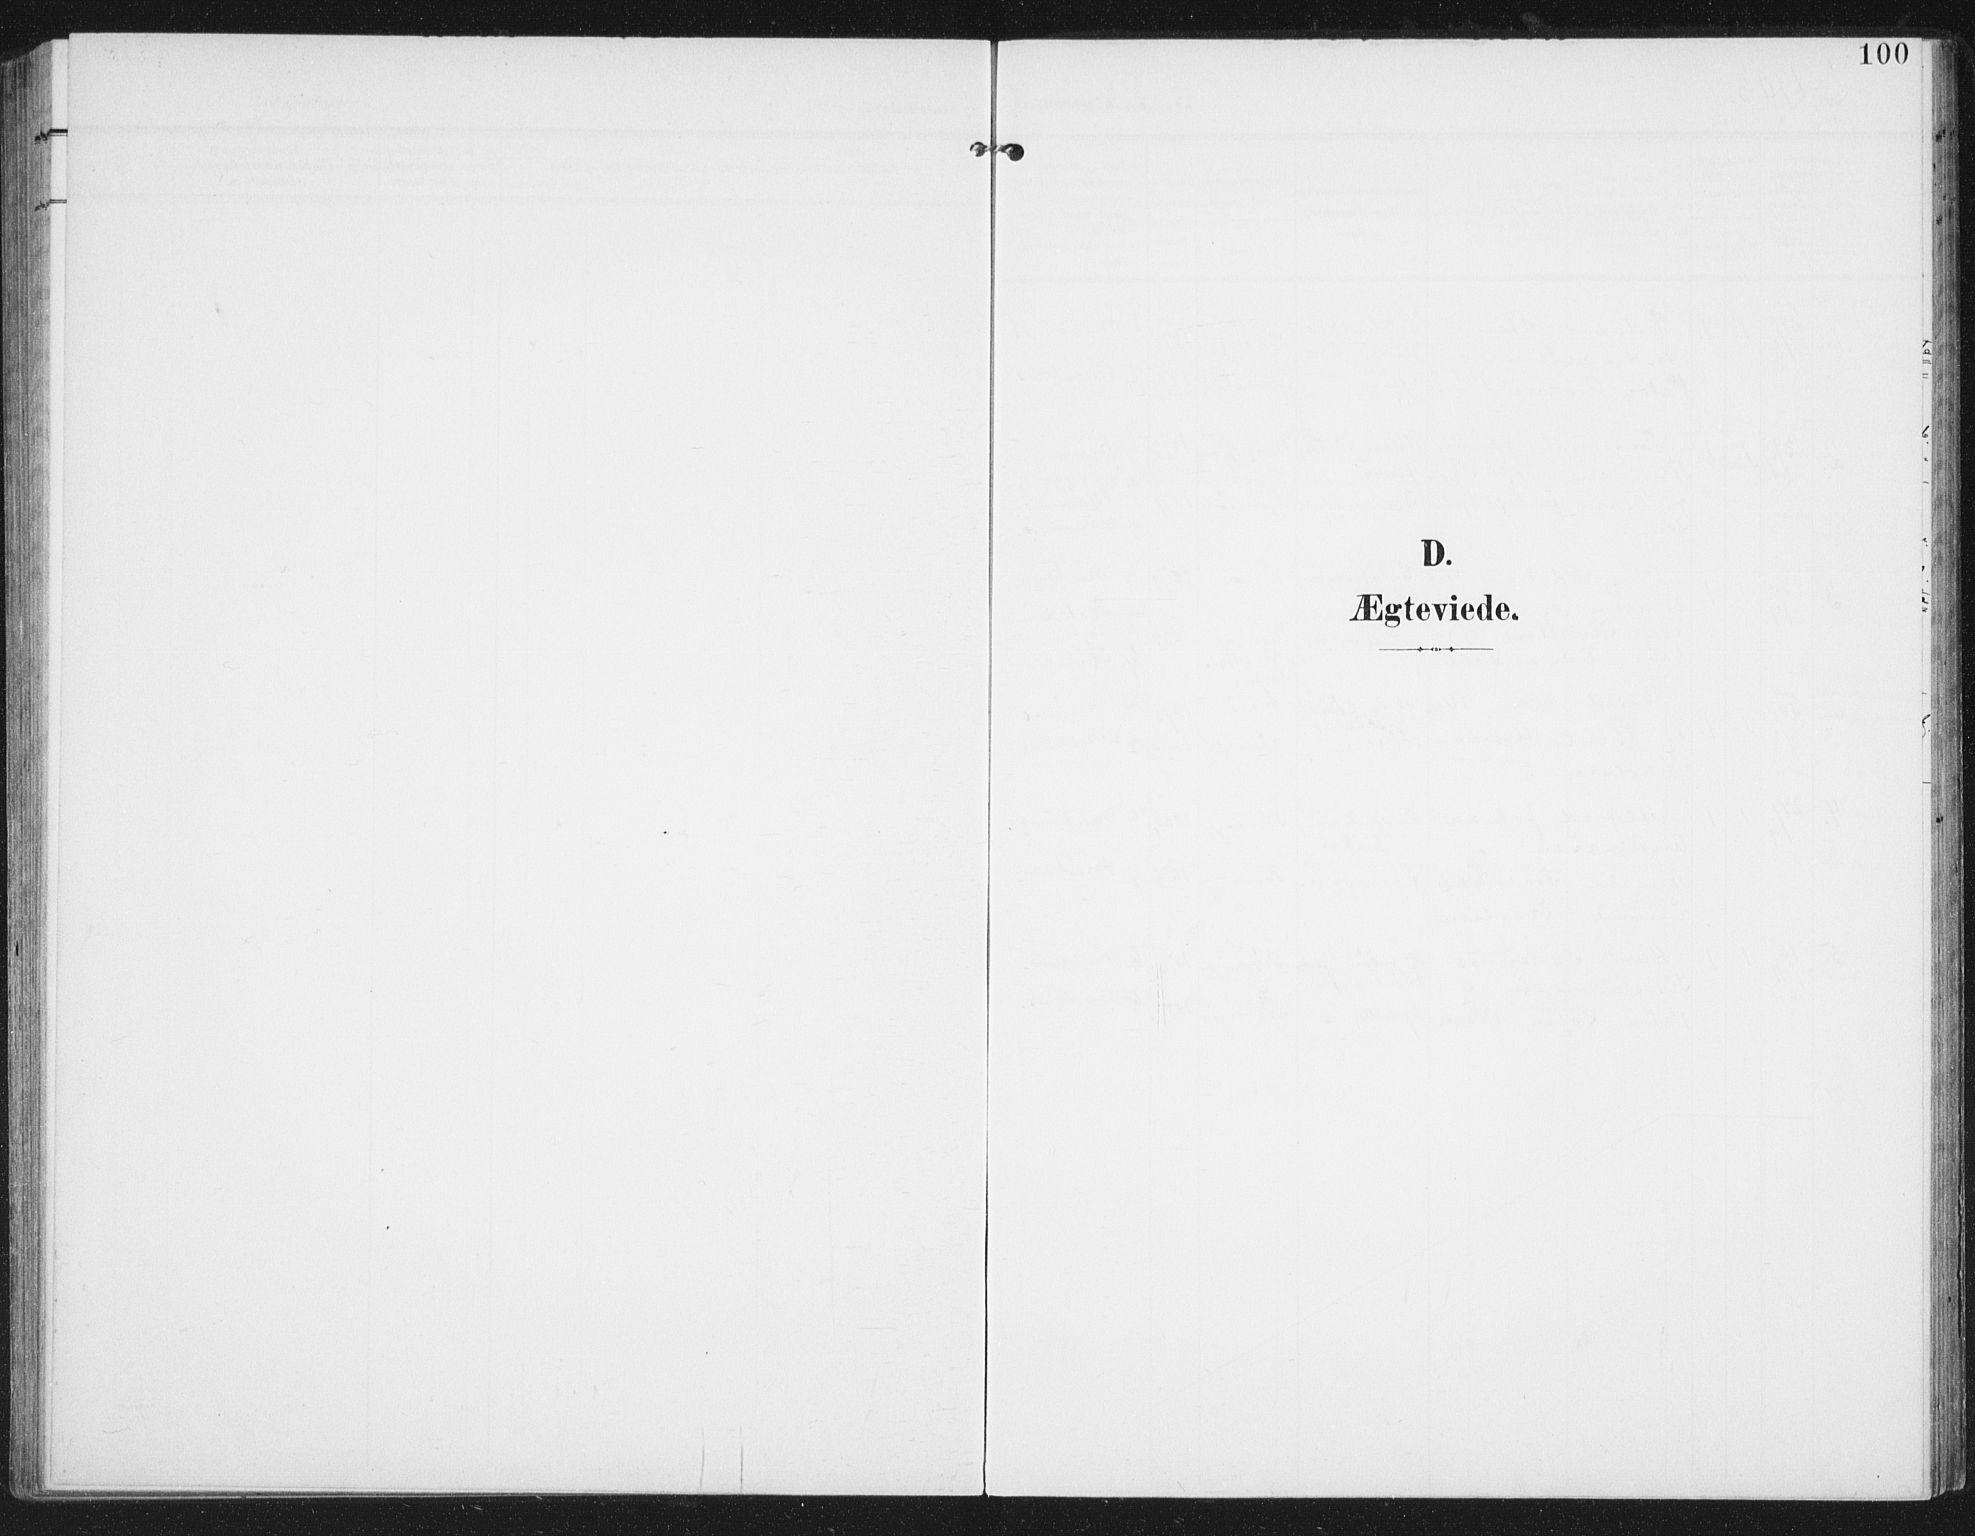 SAT, Ministerialprotokoller, klokkerbøker og fødselsregistre - Nordland, 886/L1221: Ministerialbok nr. 886A03, 1903-1913, s. 100